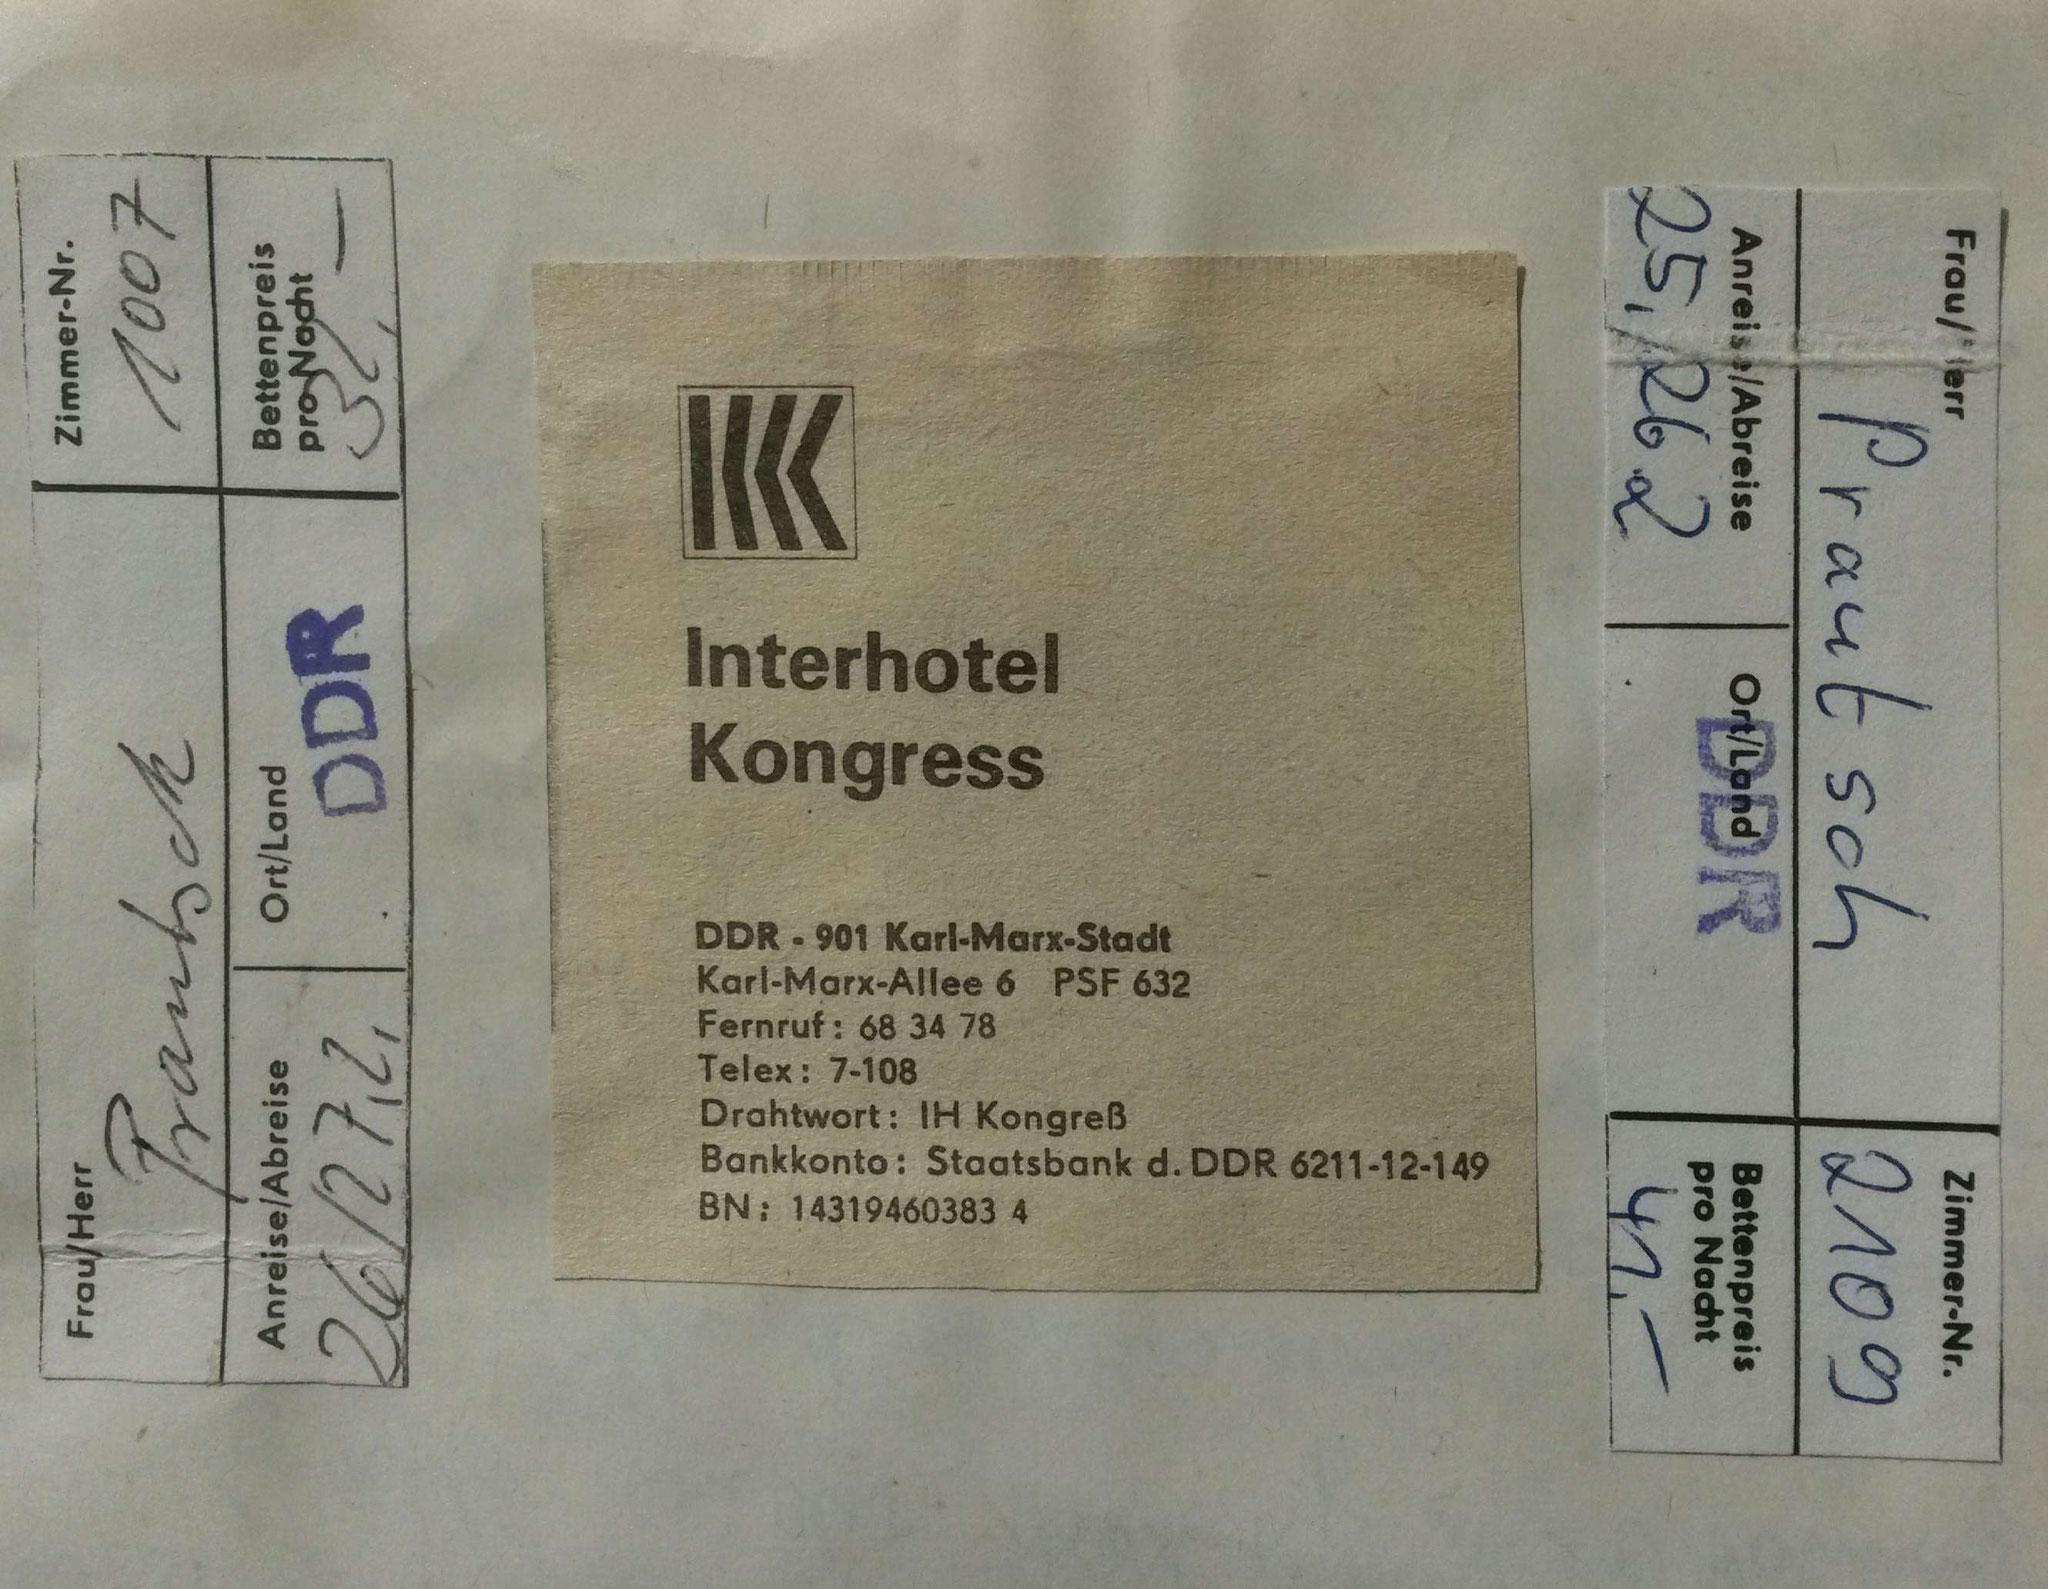 Interhotel Kongress Karl-Marx-Stadt (Chemnitz) - 1982